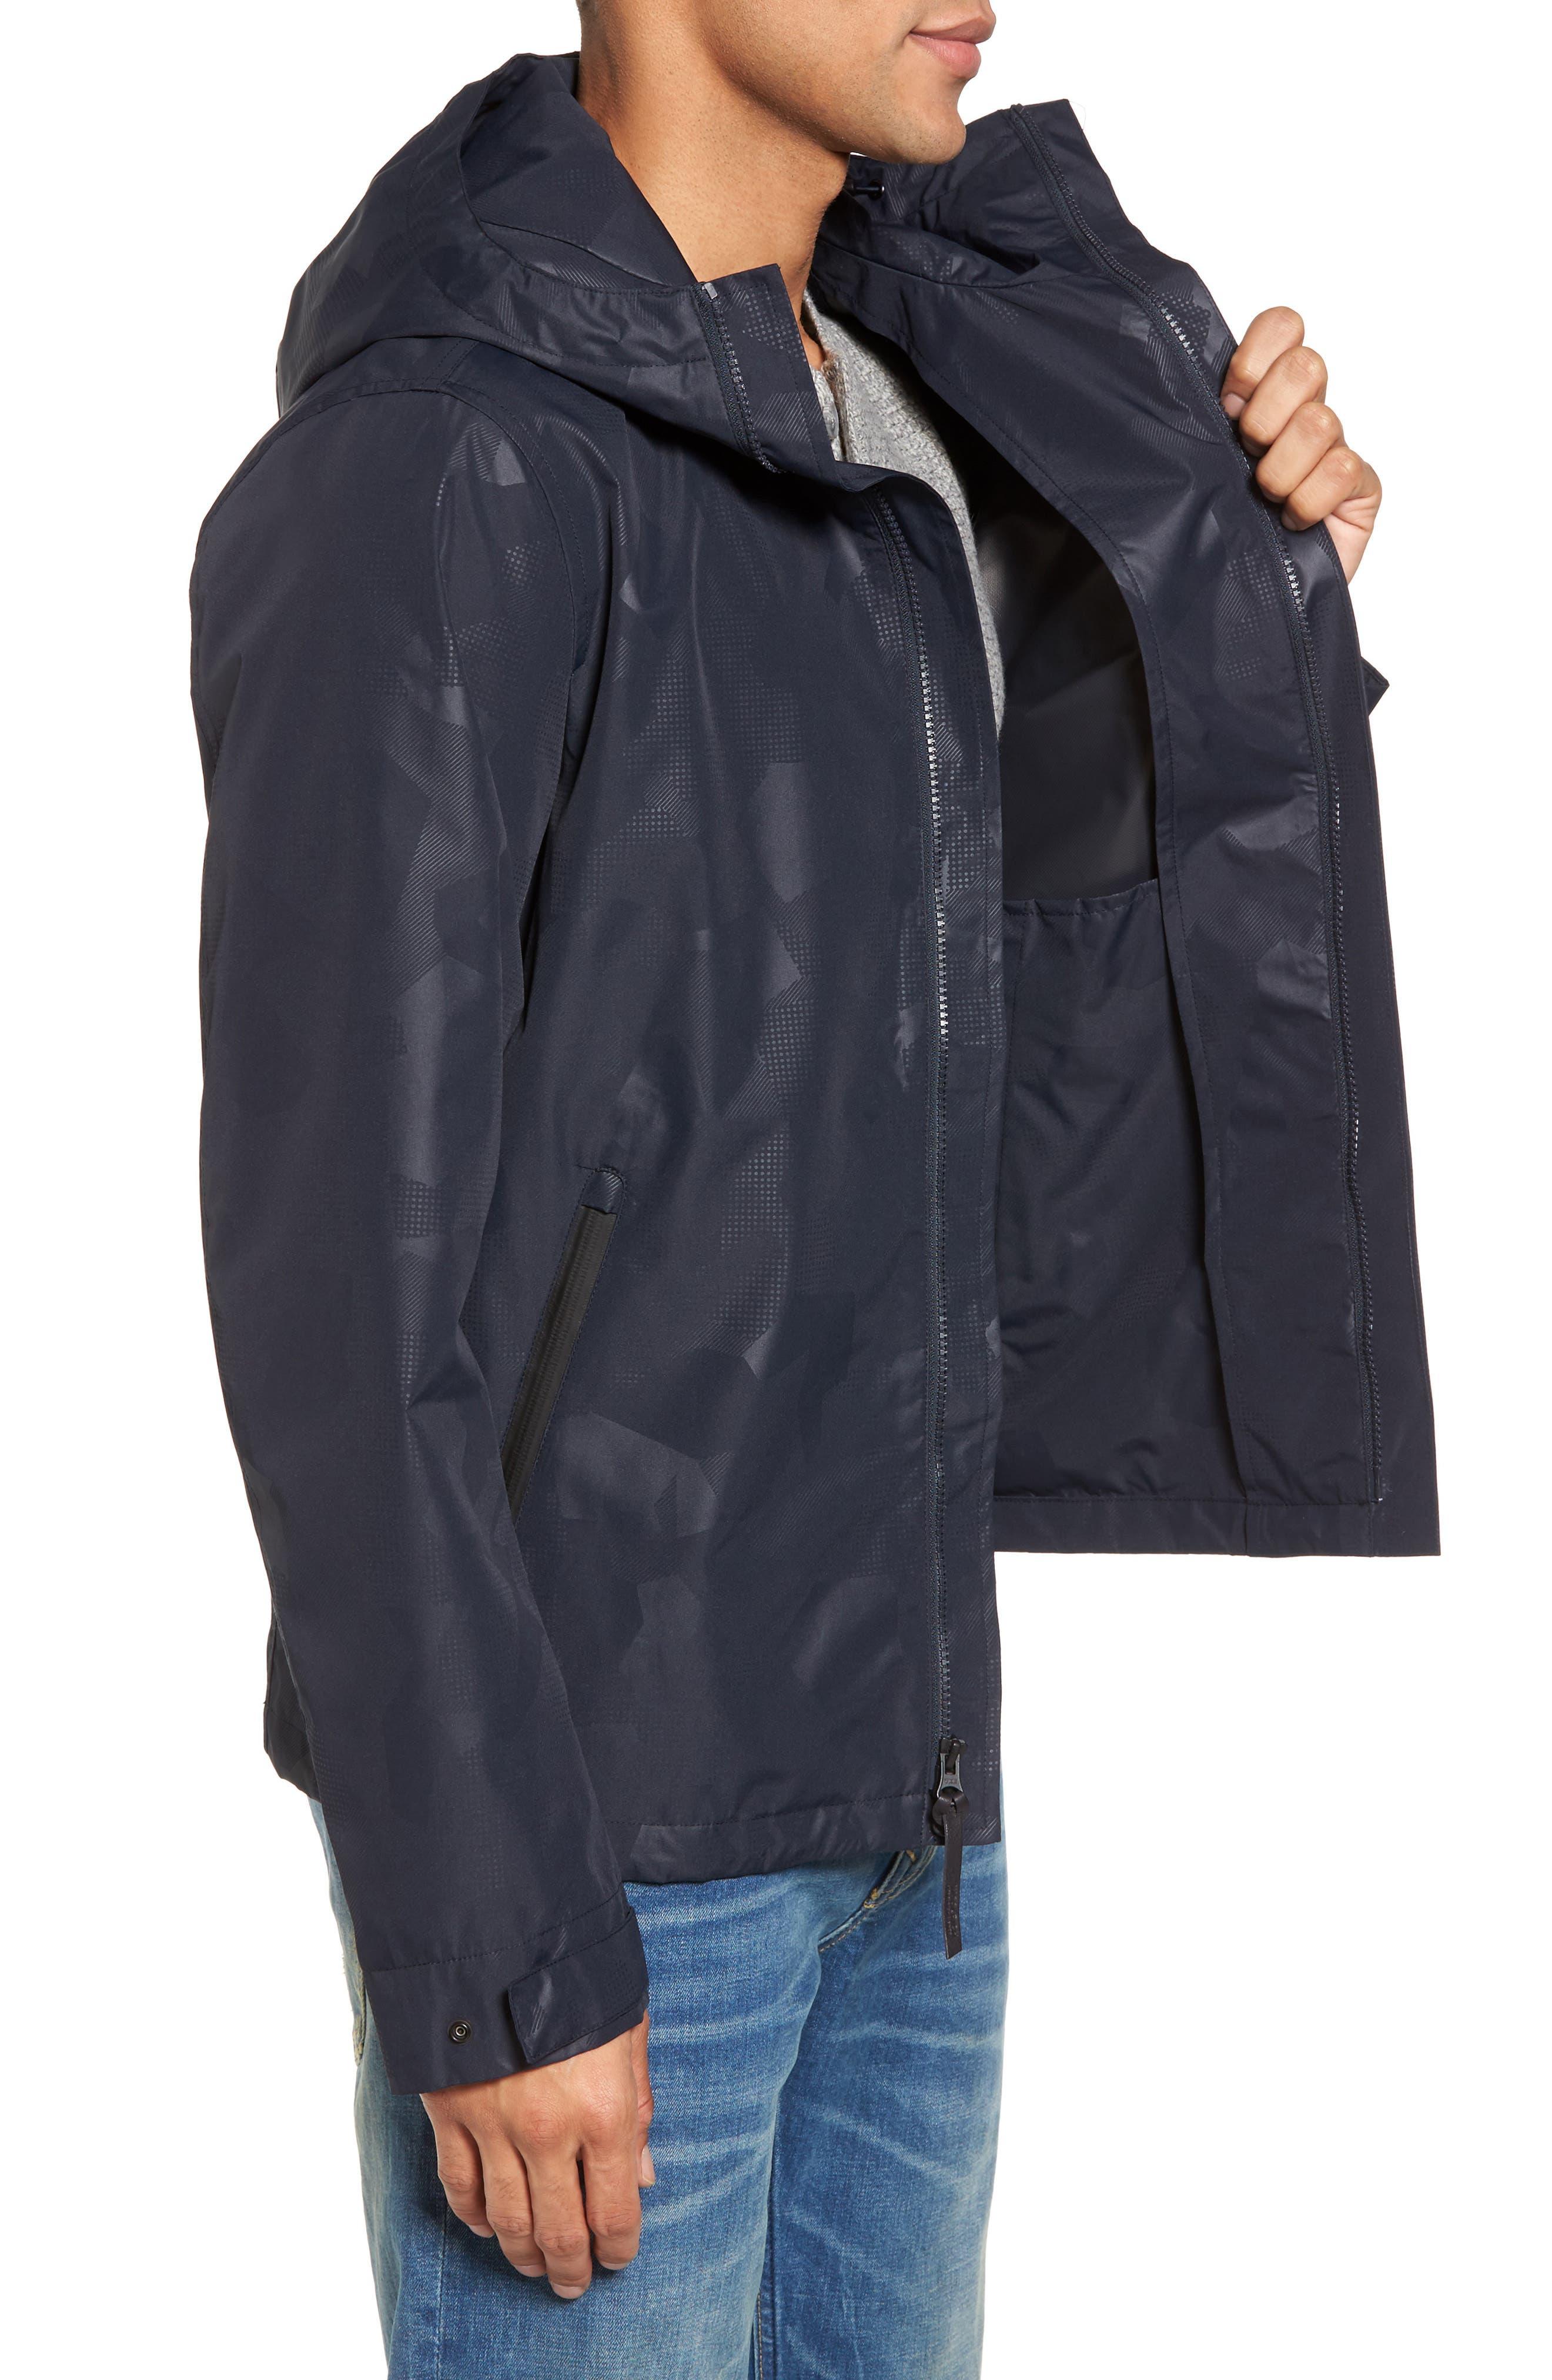 John Rich & Bros. Atlantic Camo Hooded Jacket,                             Alternate thumbnail 3, color,                             Melton Blue Camo